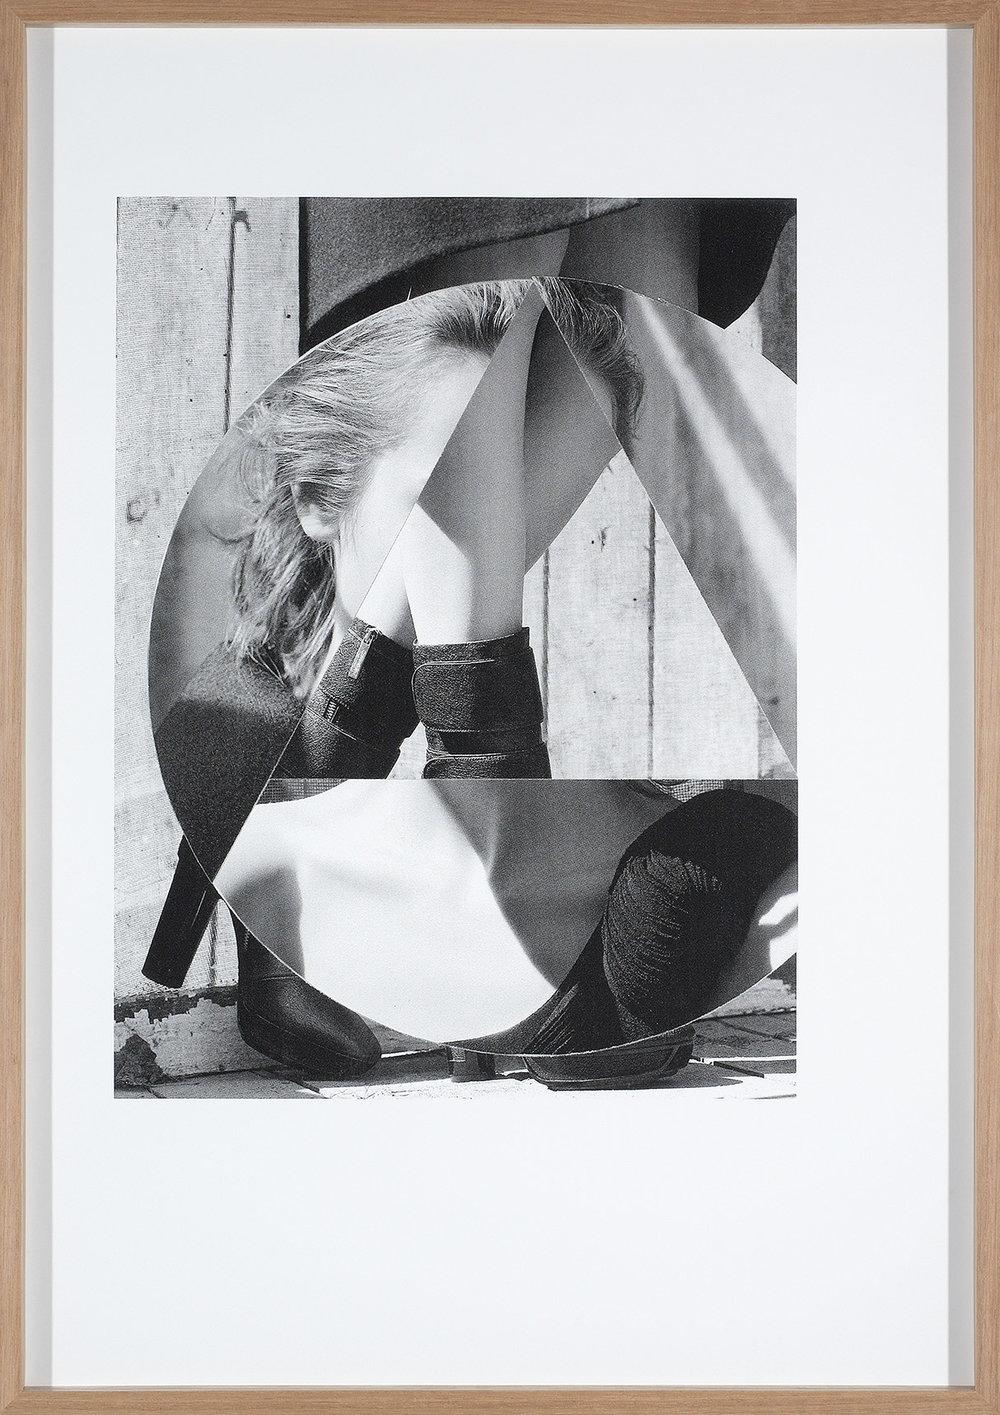 Brad Haylock,  Still Discontent CK26 , 2011, pigment print on paper, 84 x 59cm